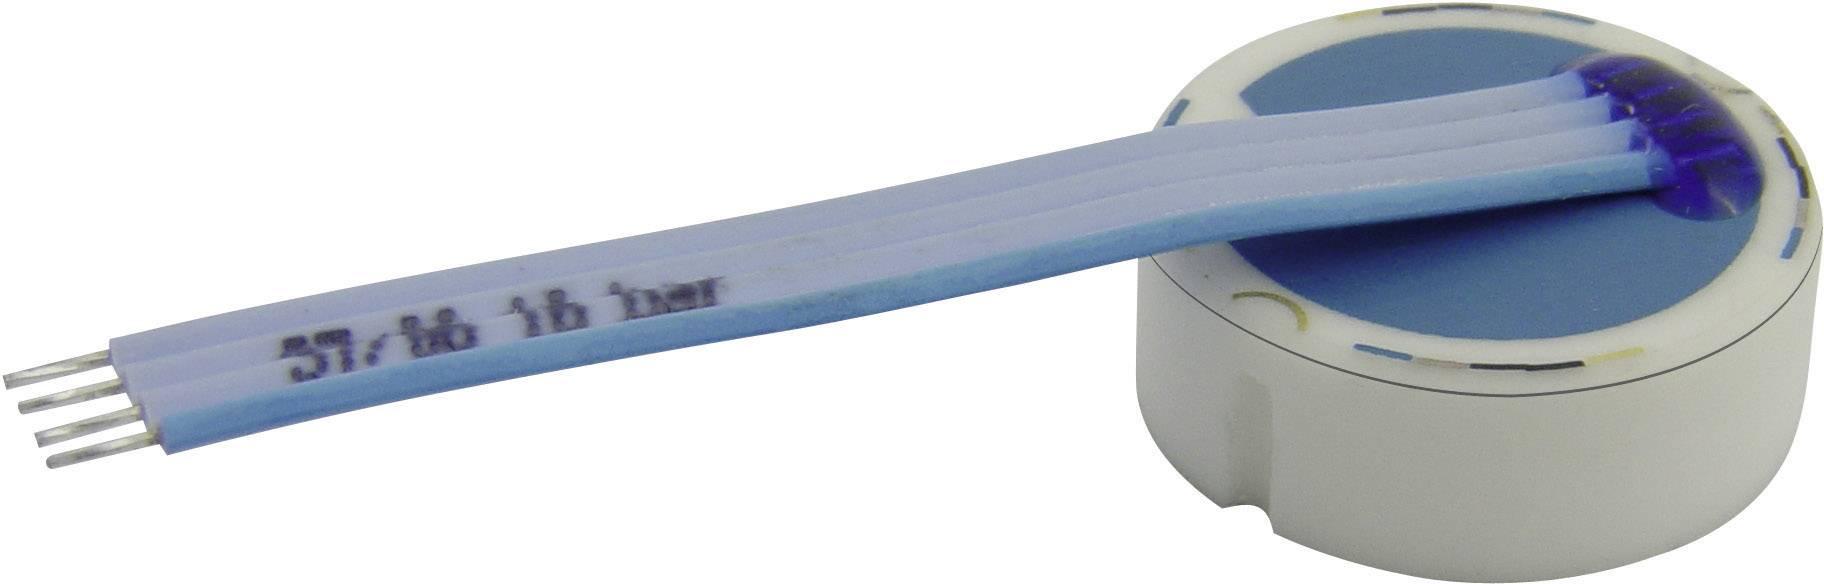 Senzor tlaku B & B Thermo-Technik DS-KE-D-A2B, 2 bar do 2 bar